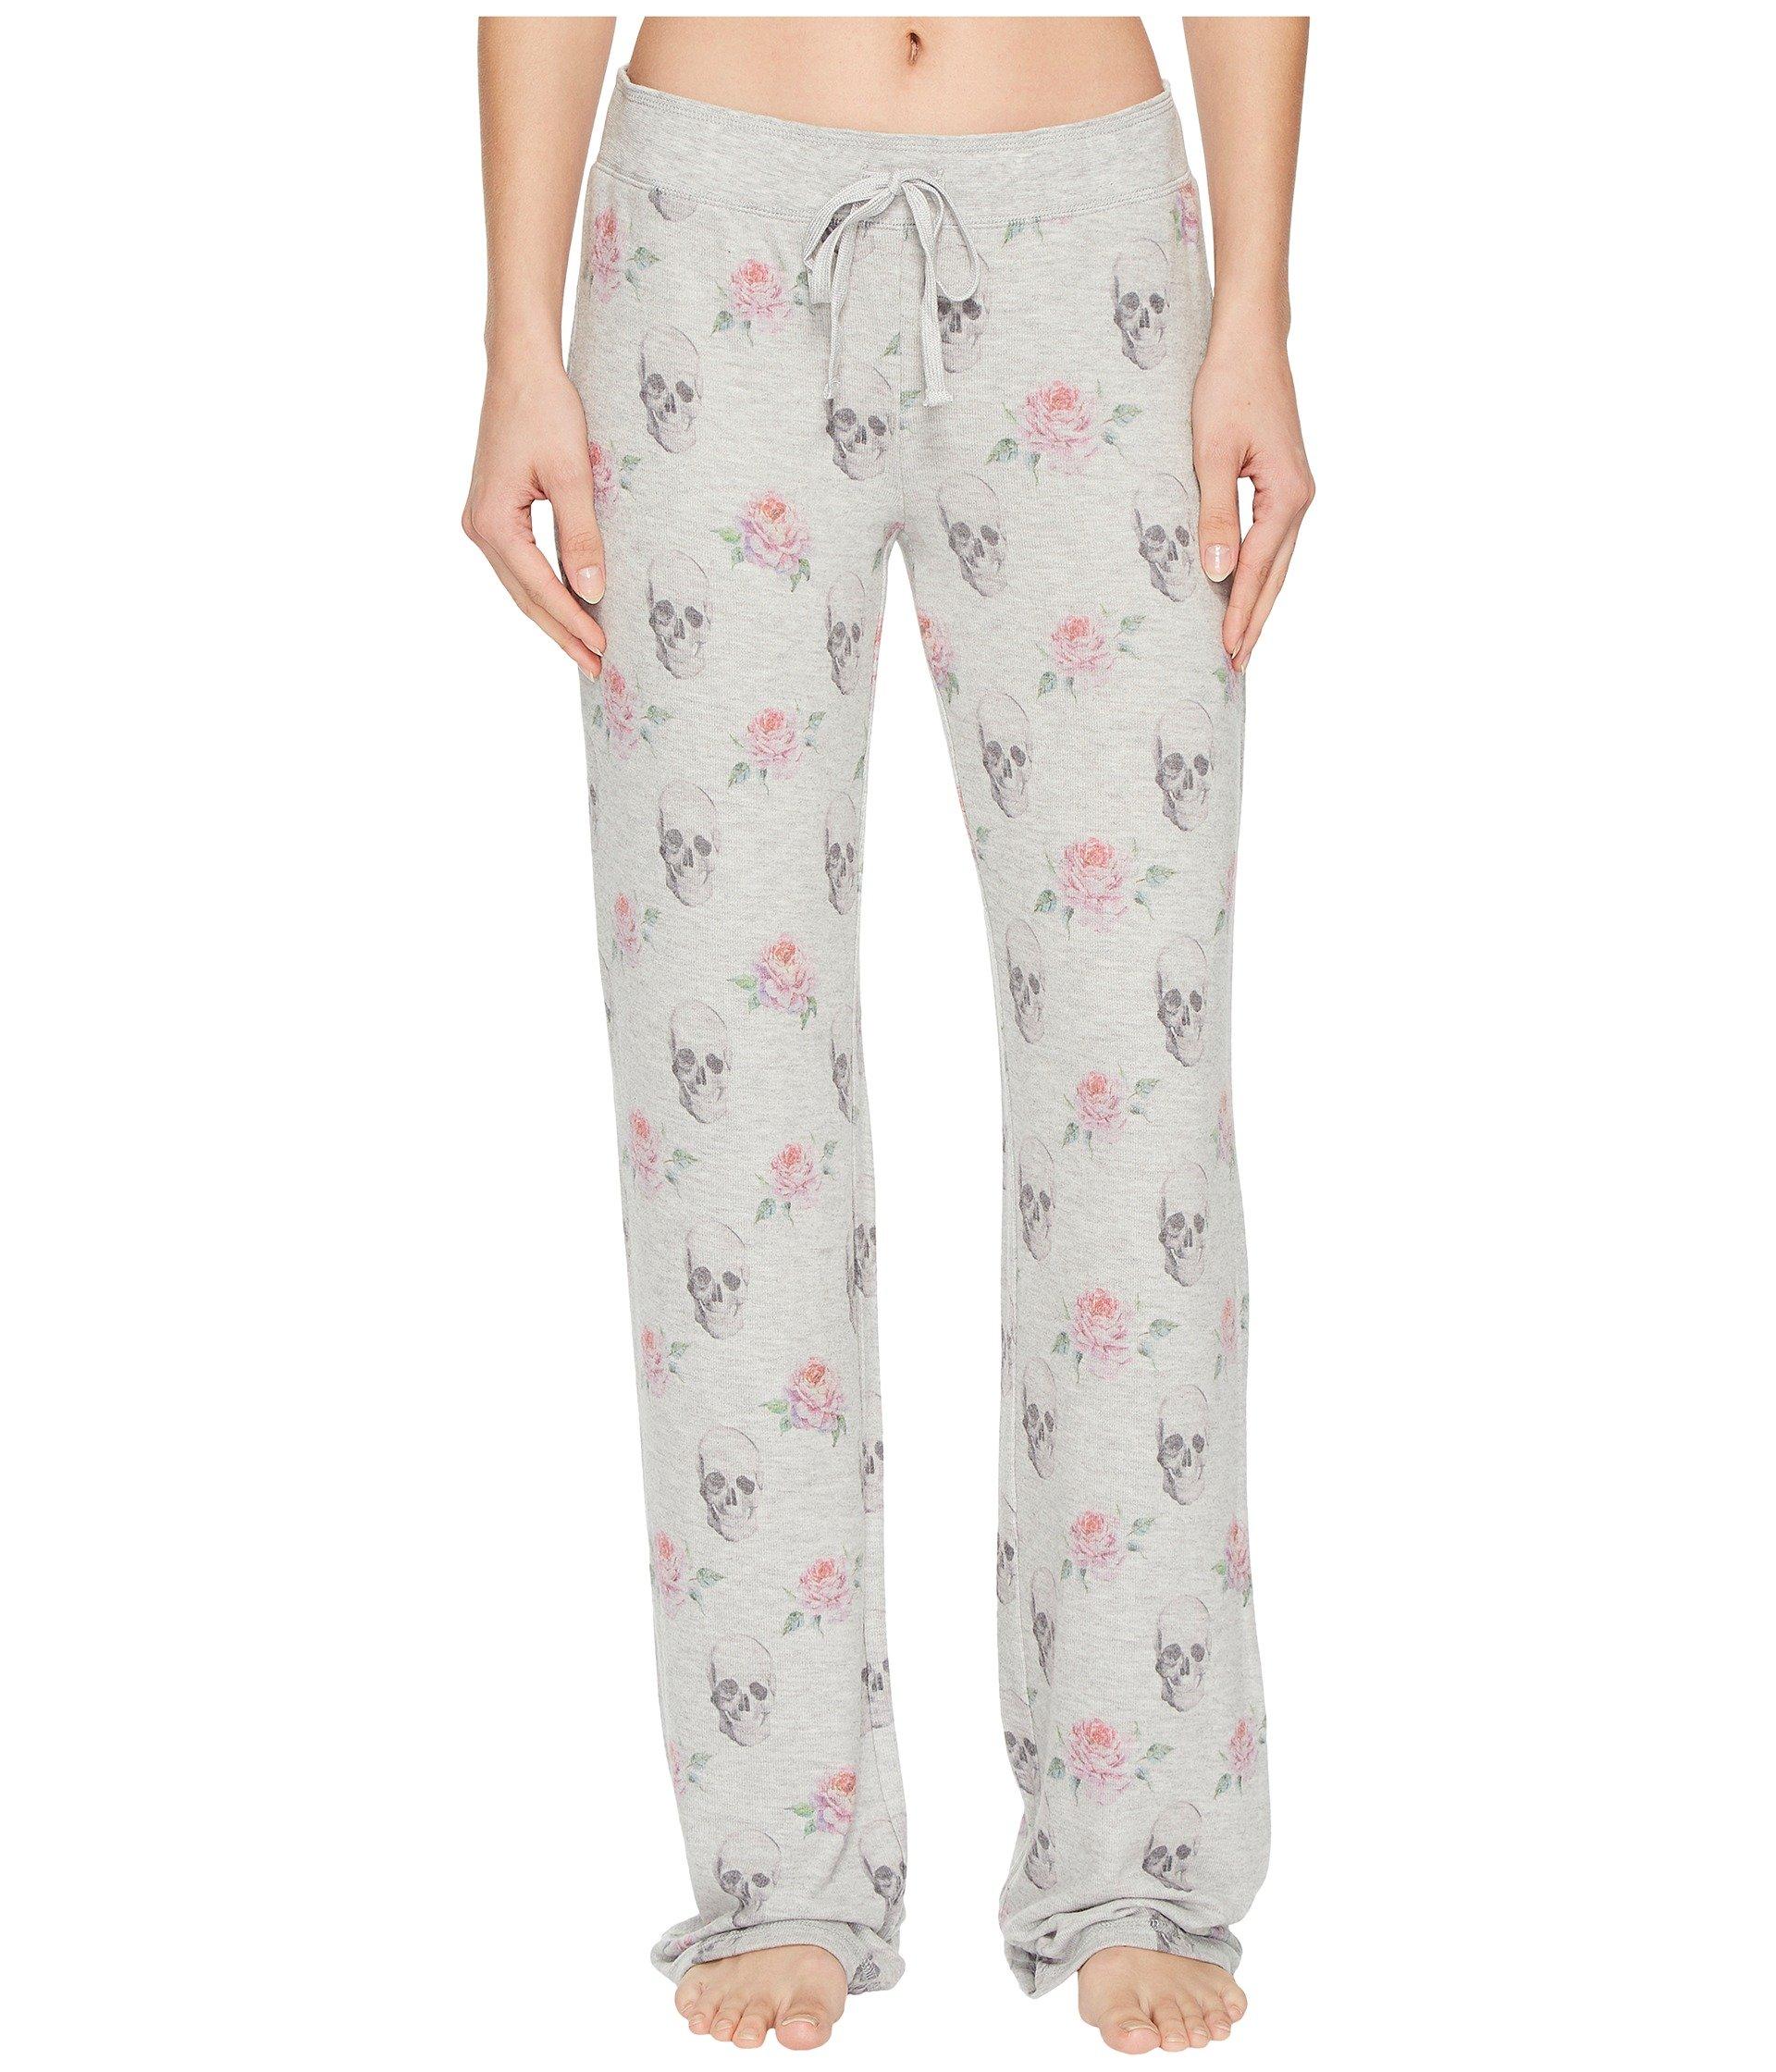 Pantalón de Pijama para Mujer P.J. Salvage Skulls and Roses PJ Pants  + P.J. Salvage en VeoyCompro.net